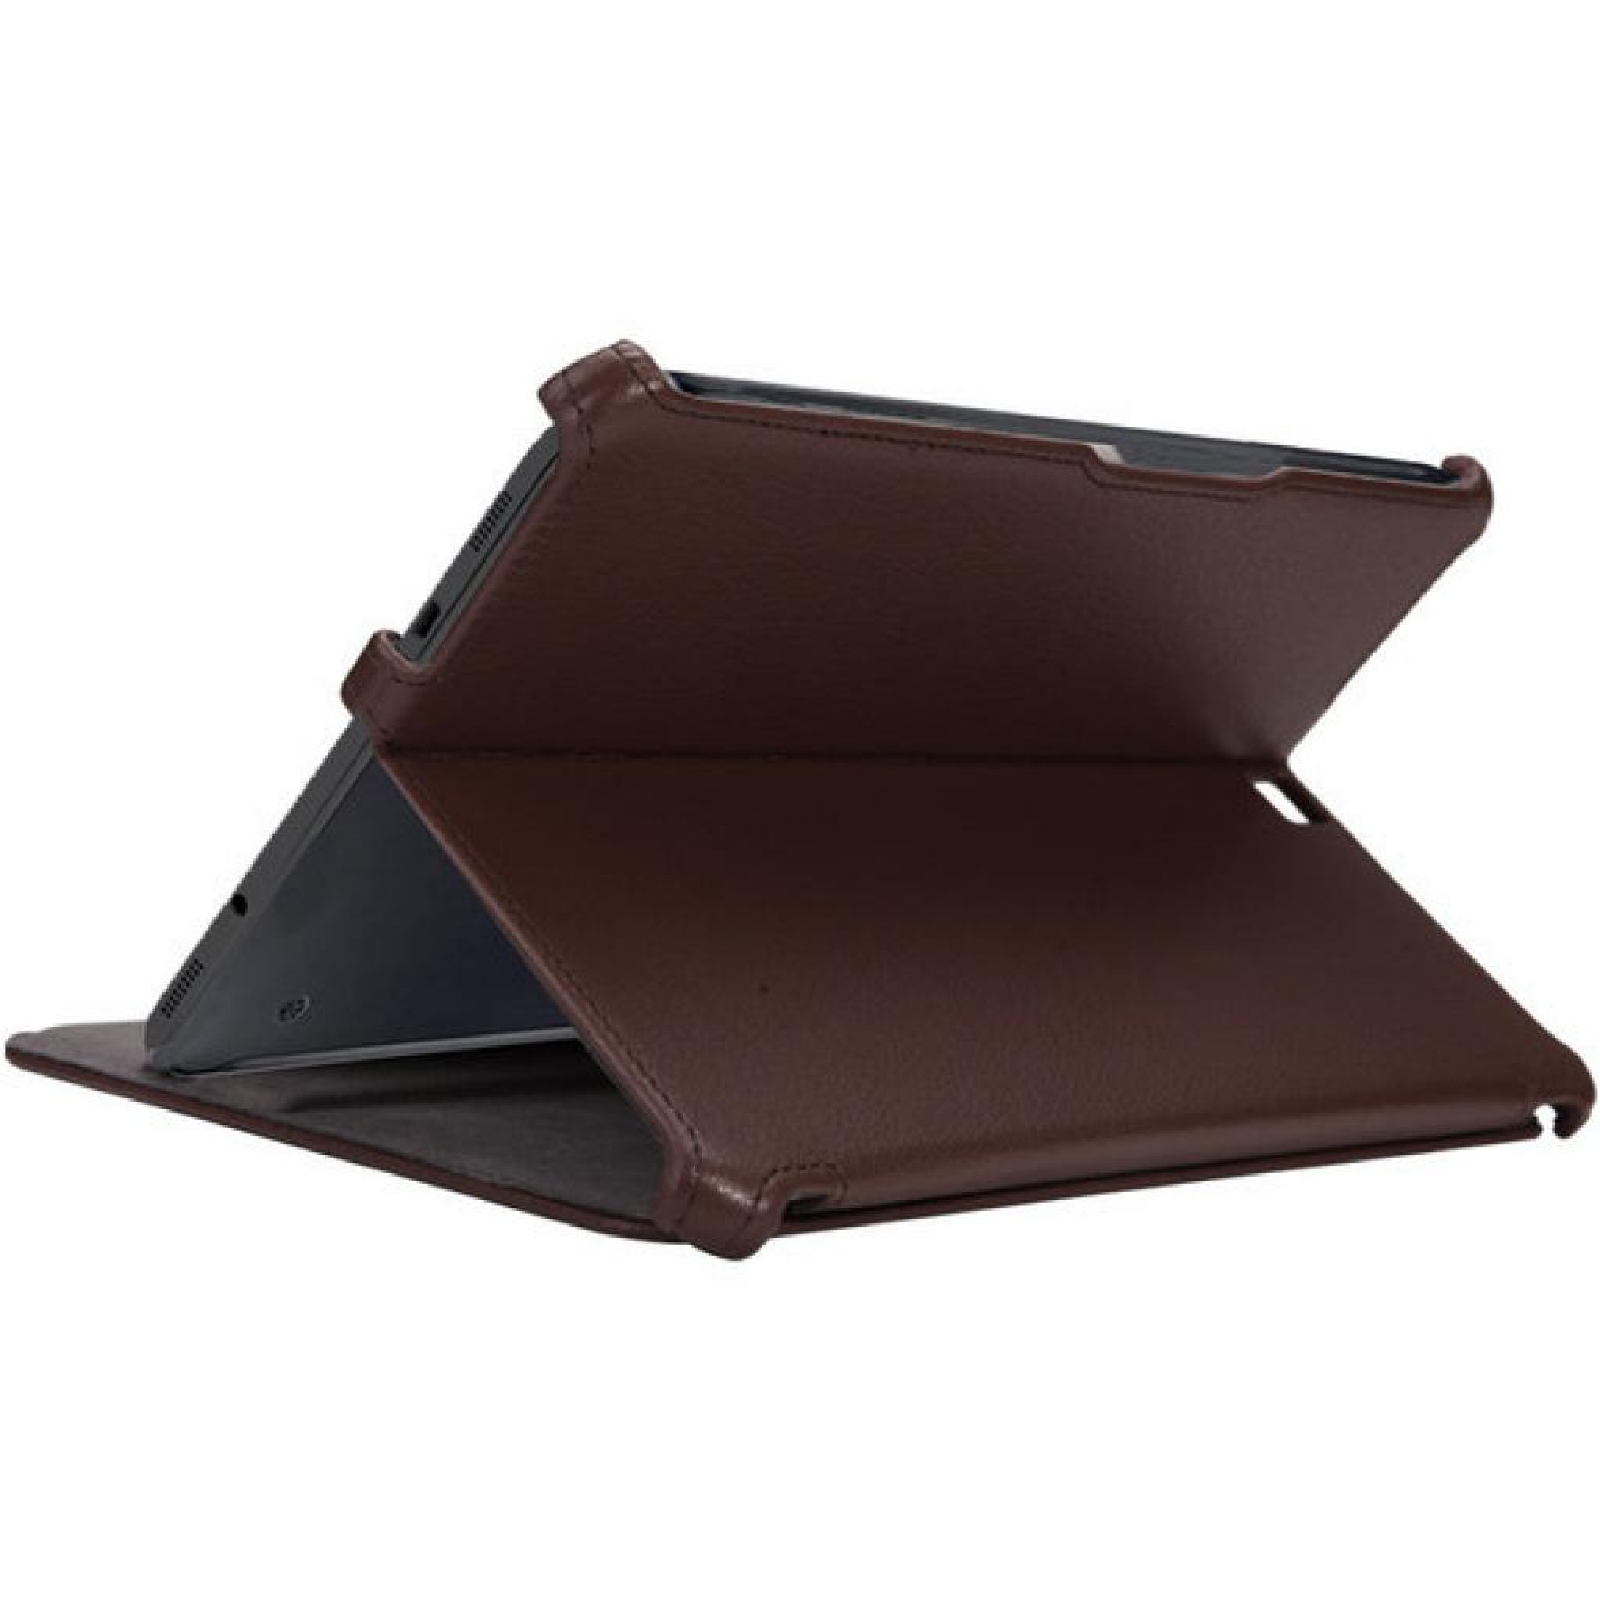 Чехол для планшета AirOn для Samsung Galaxy Tab S 2 8.0 brown (4822352778521) изображение 7